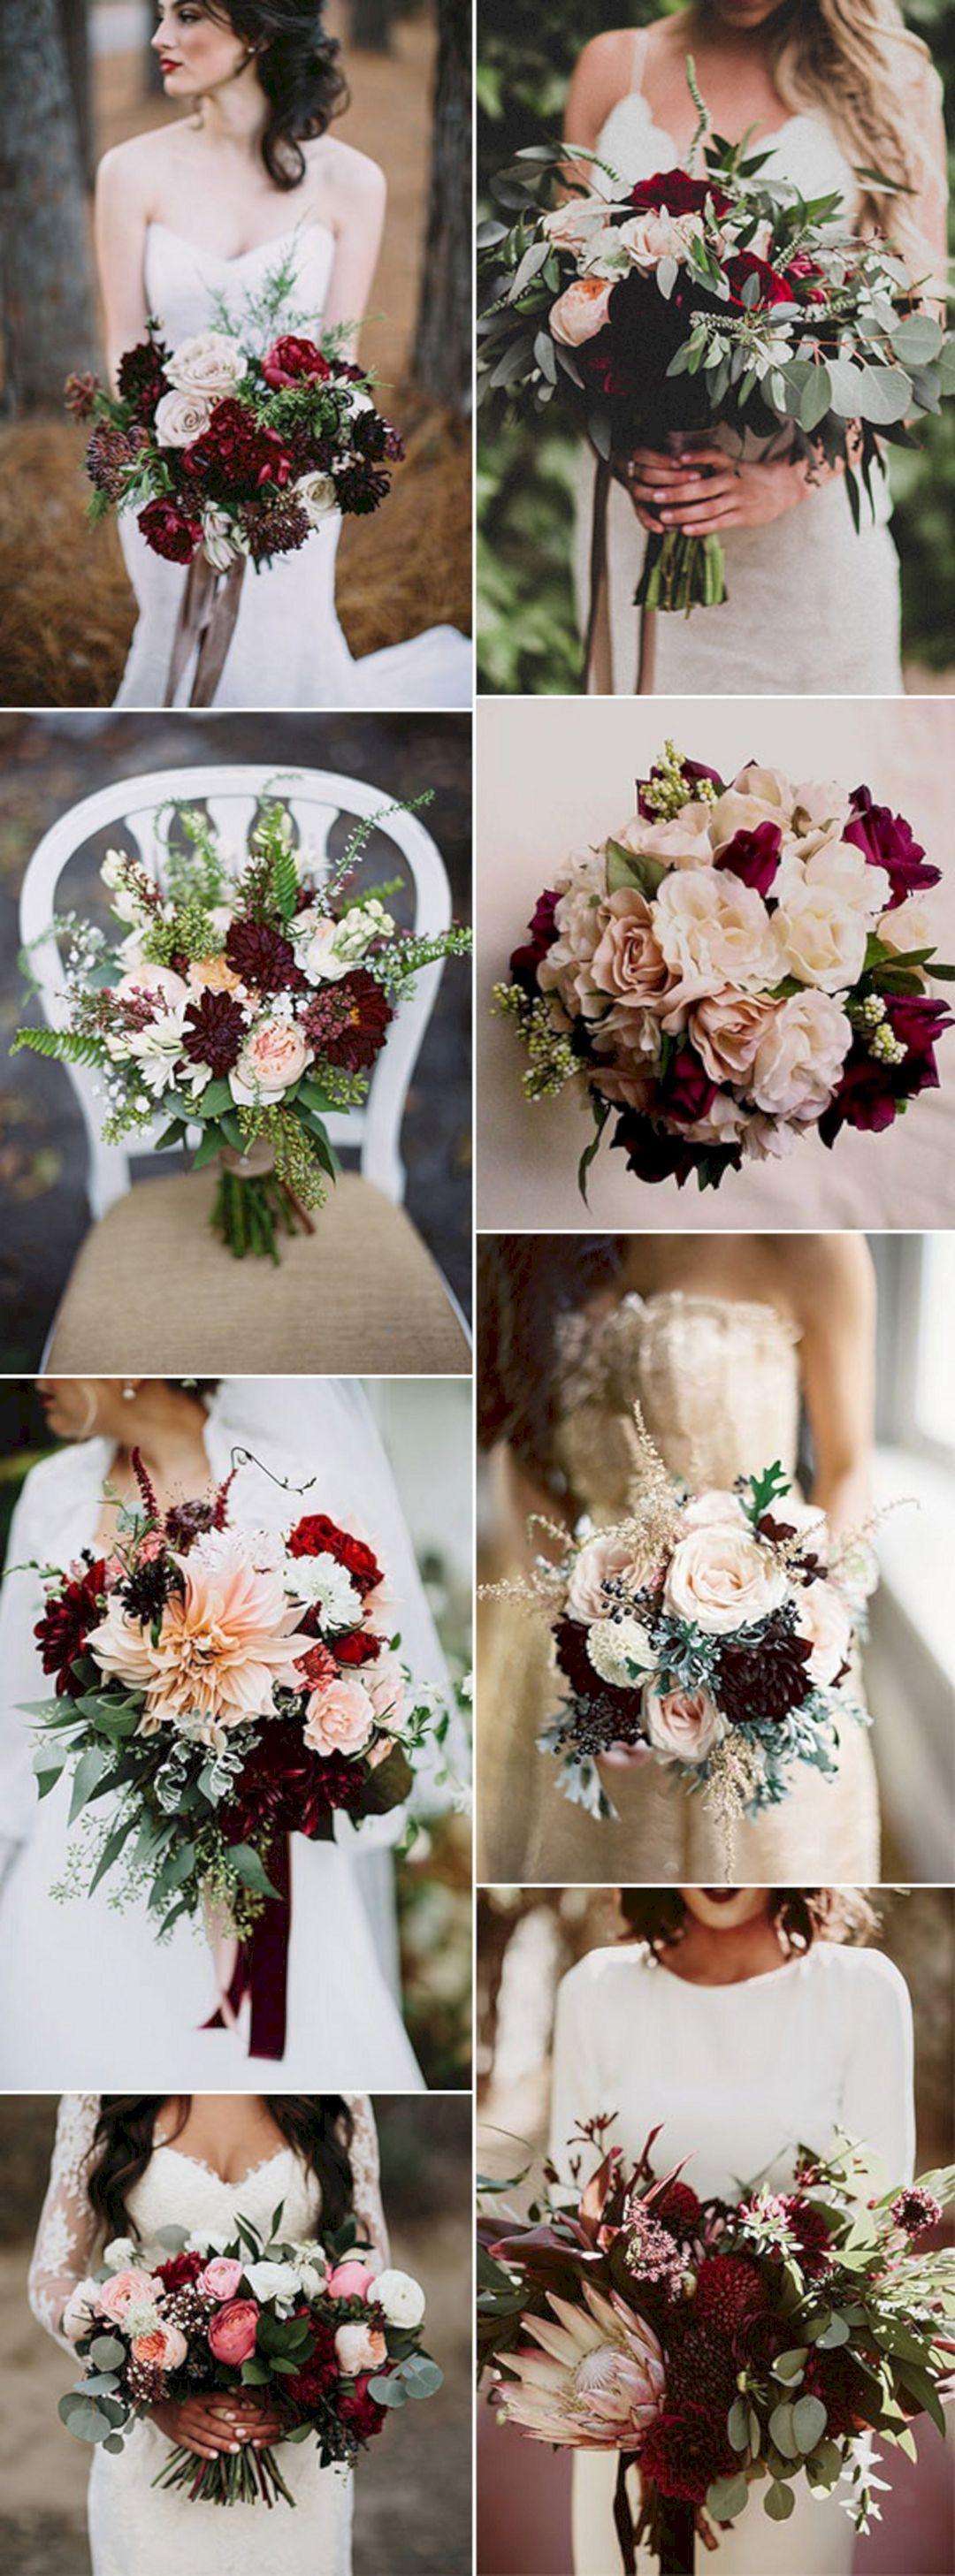 Wedding decoration ideas burgundy  Wonderful Winter Theme Wedding Ideas  Perfect wedding Centerpieces